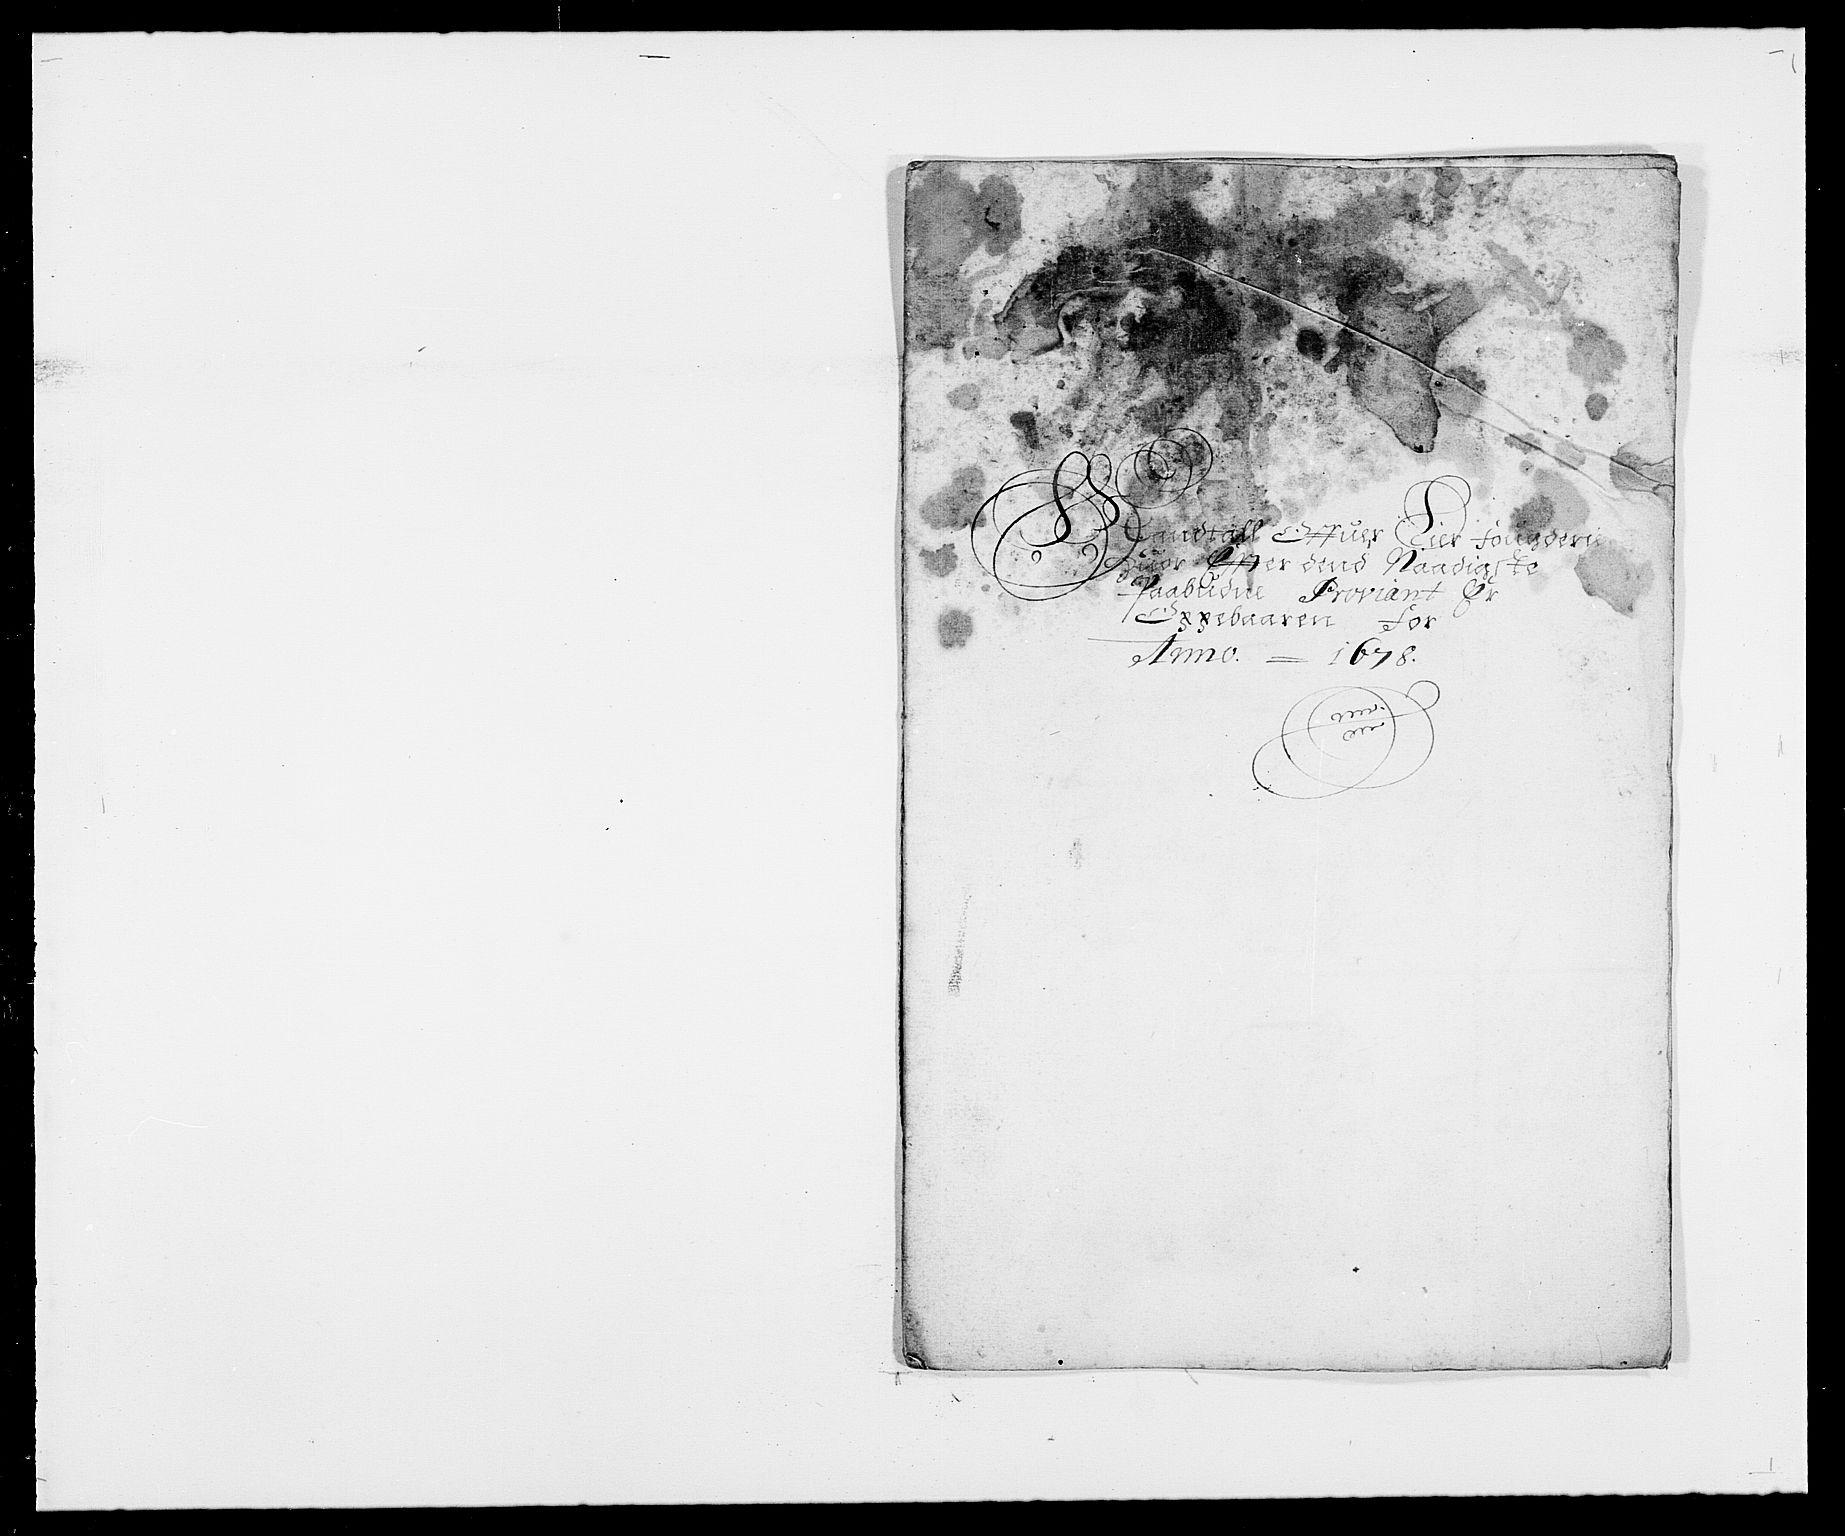 RA, Rentekammeret inntil 1814, Reviderte regnskaper, Fogderegnskap, R27/L1686: Fogderegnskap Lier, 1678-1686, s. 75